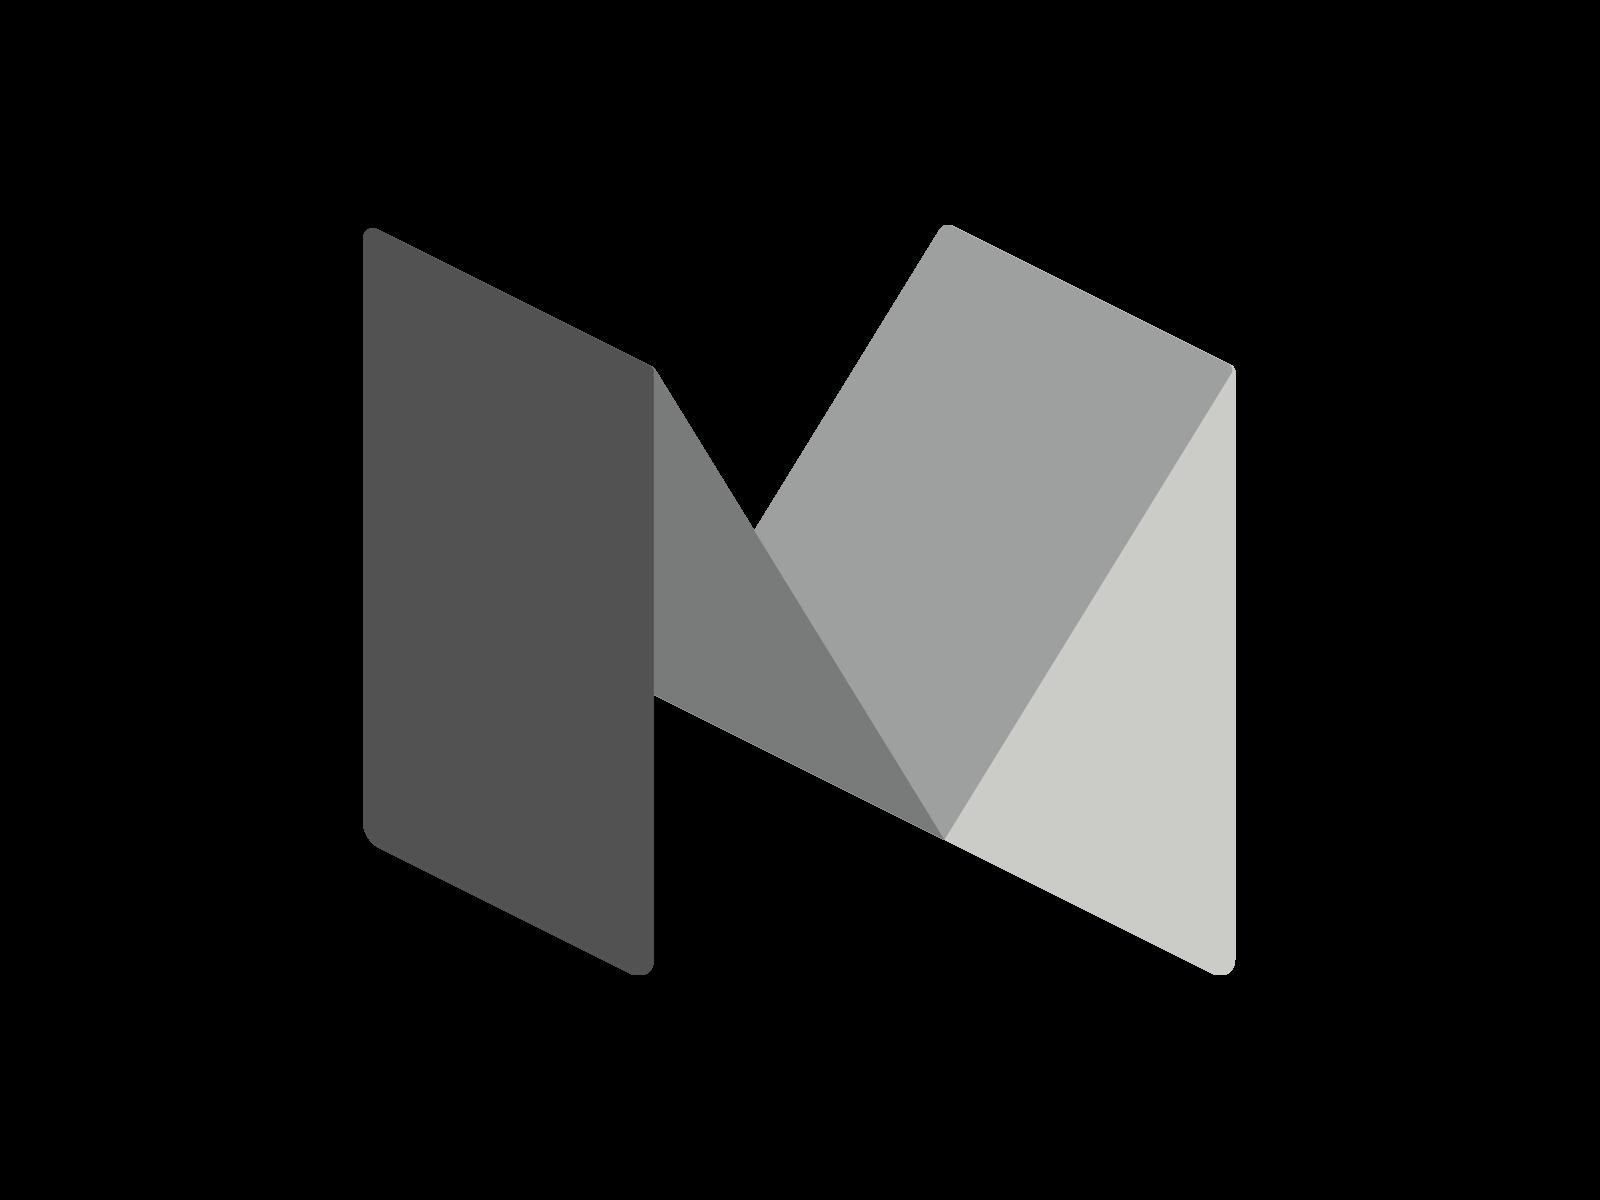 Medium Logo Transparent - Medium PNG